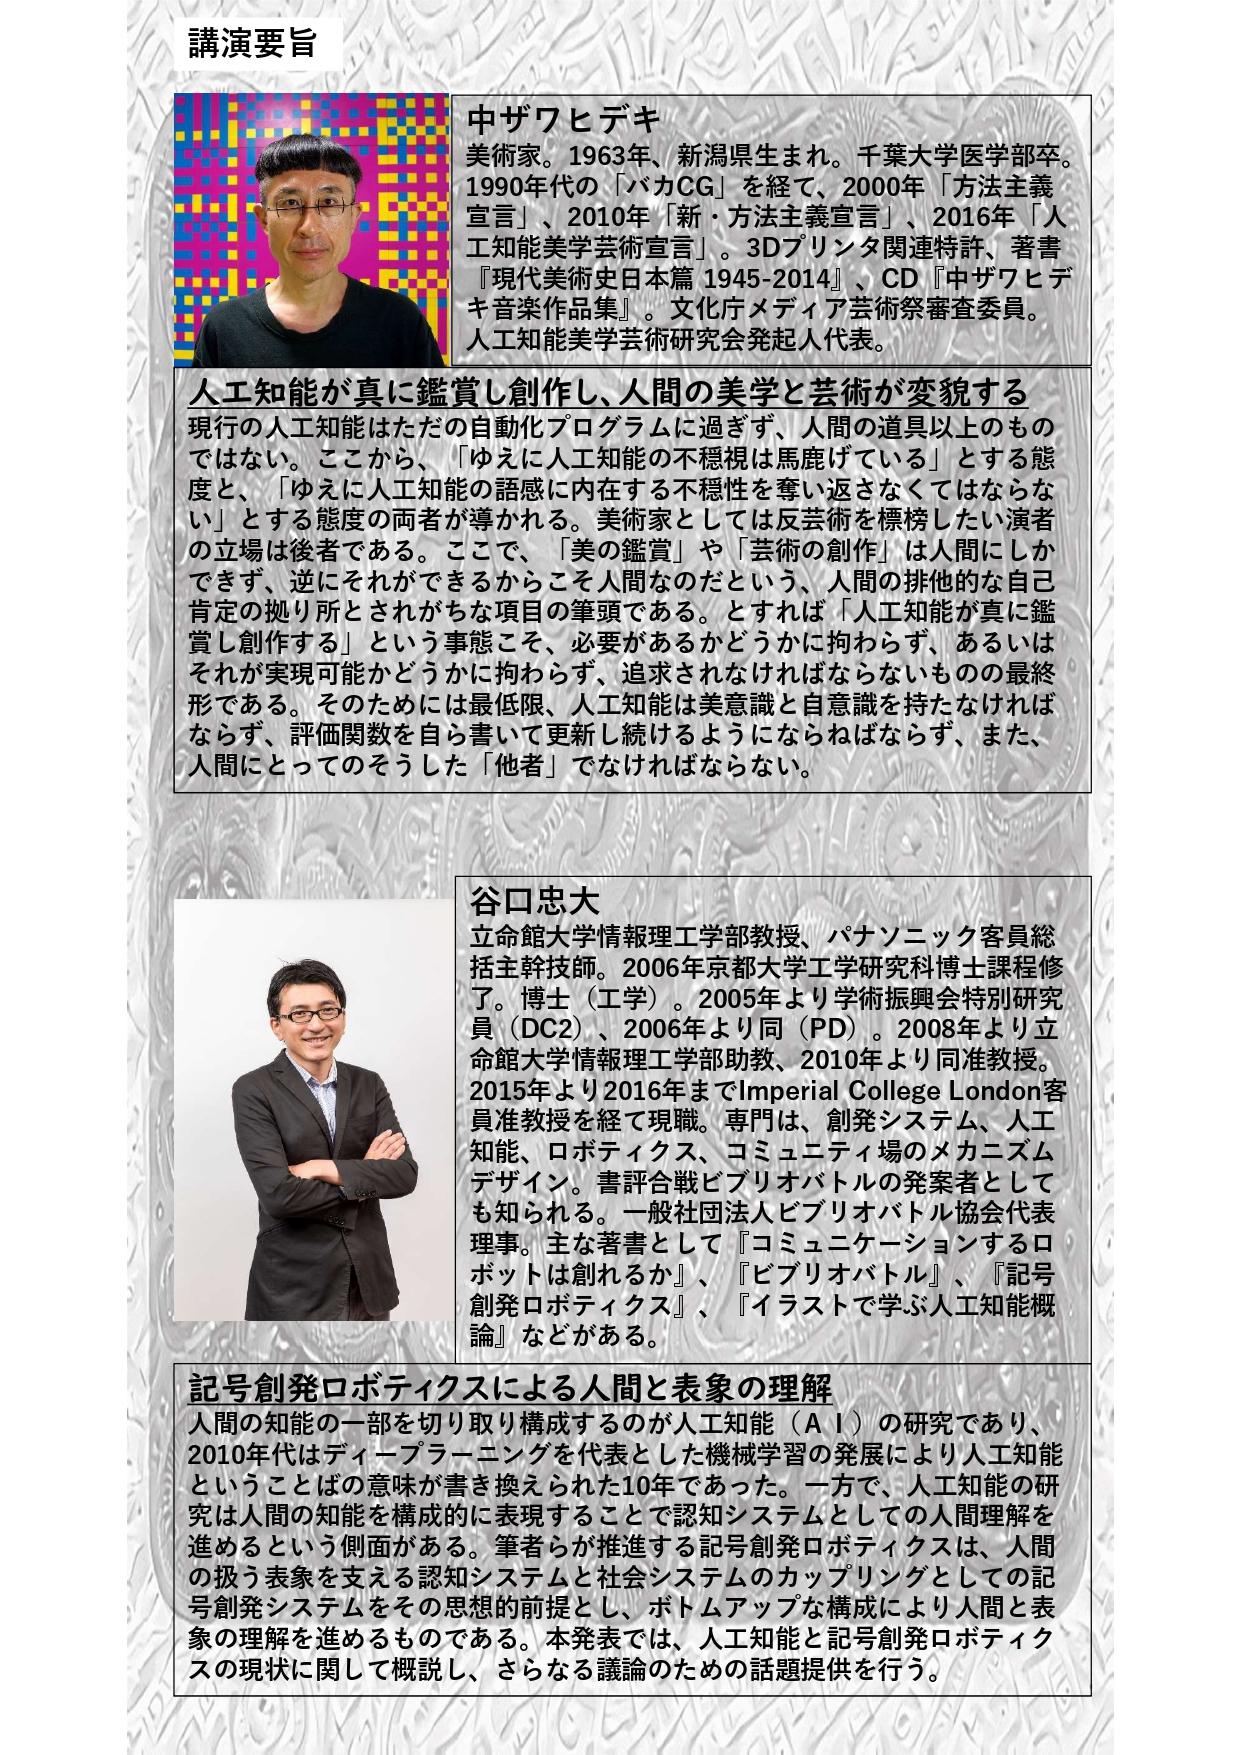 https://www.r-gscefs.jp/wp-content/uploads/2019/12/2019表象文化論2.jpg